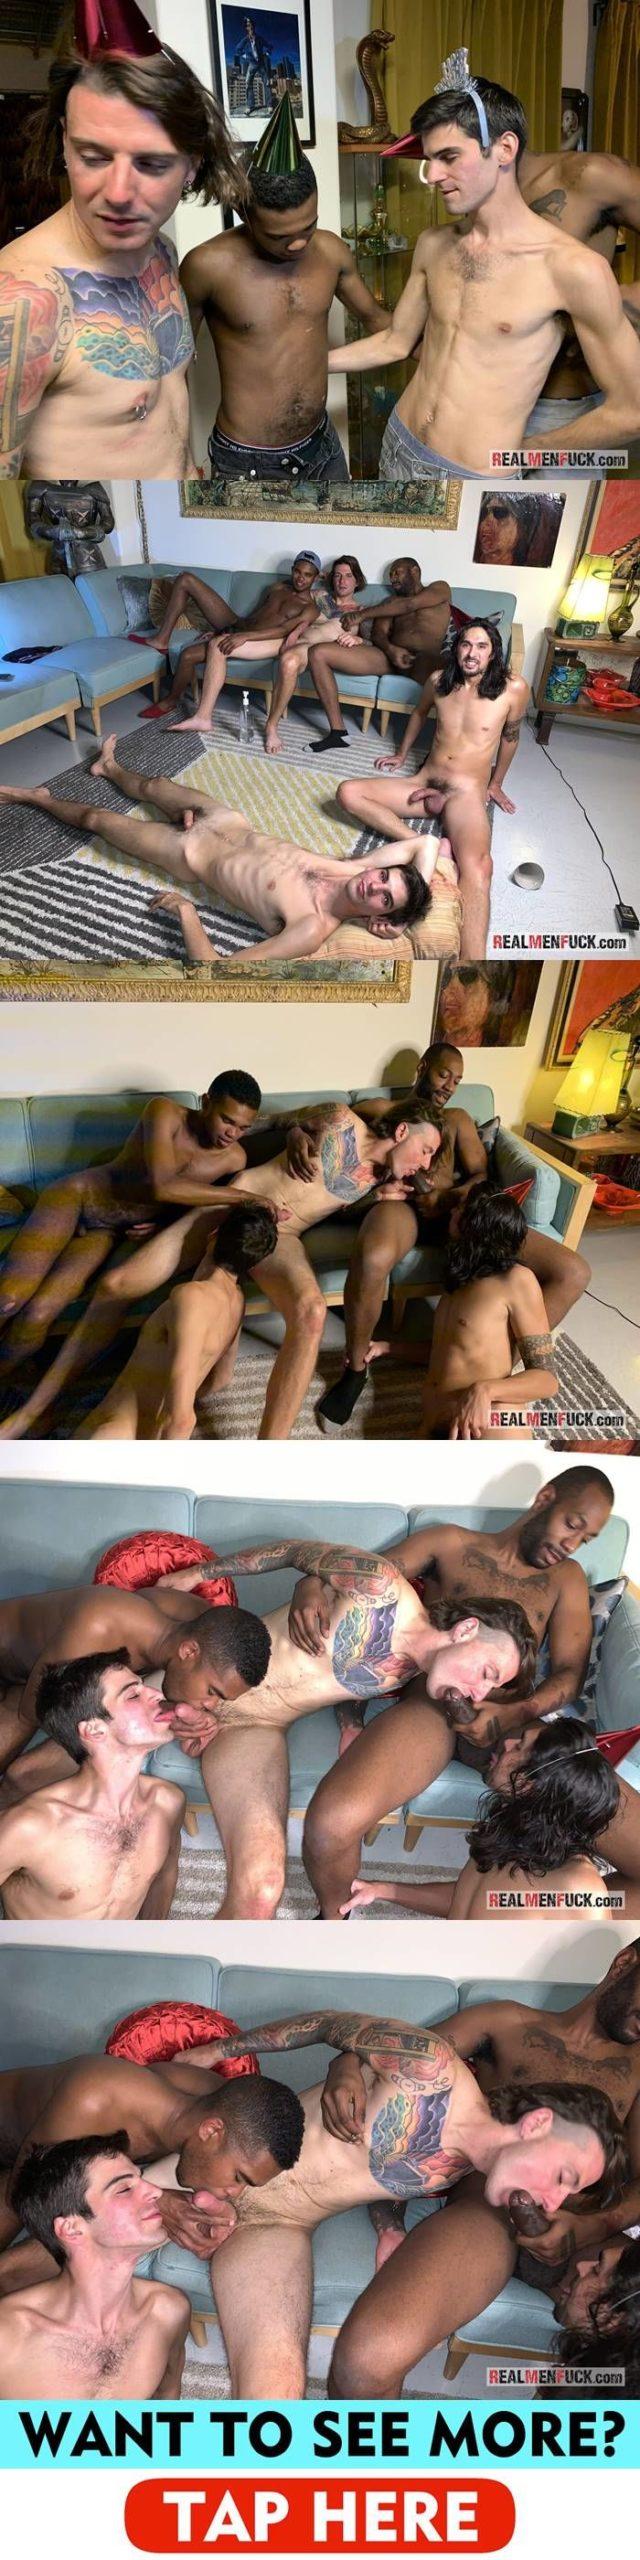 Real Men Fuck: Birthday Orgy - Part 1